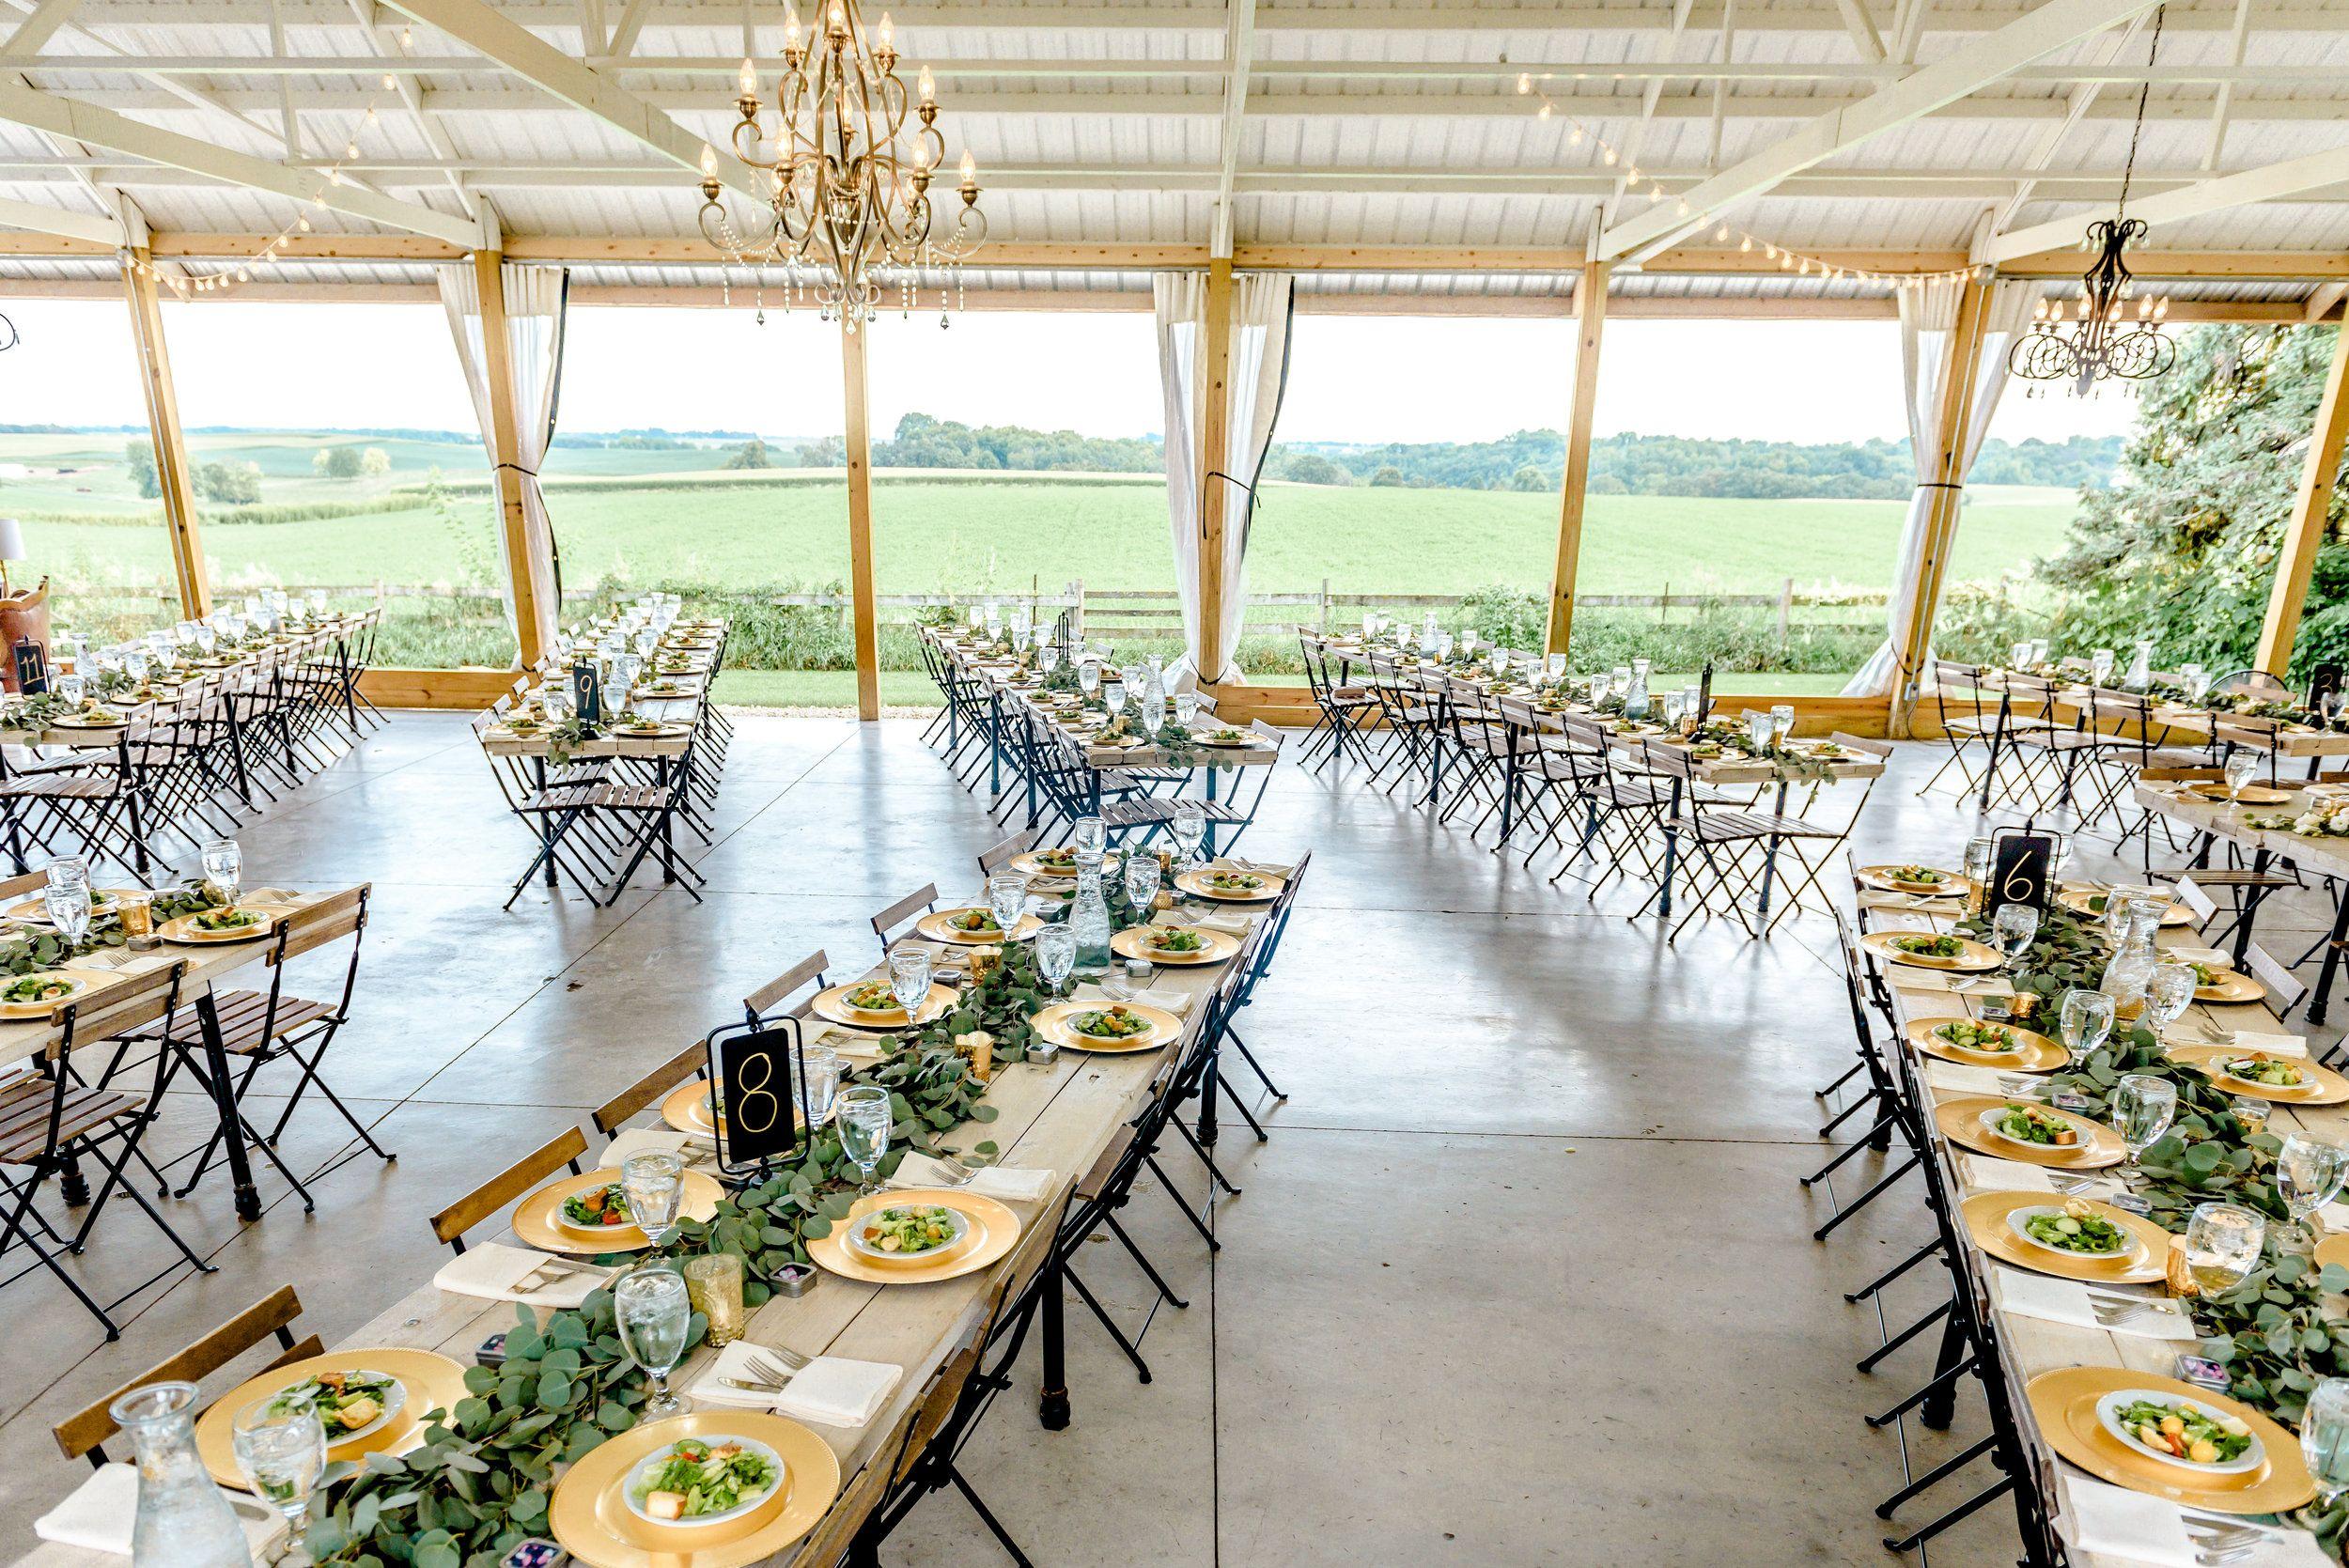 Reception Decor Table Layout Design 2019 Wedding Trends Simple Reception Decor Eucalyptus Garlands Rustic Garden Wedding Rustic Gardens Mn Wedding Venues